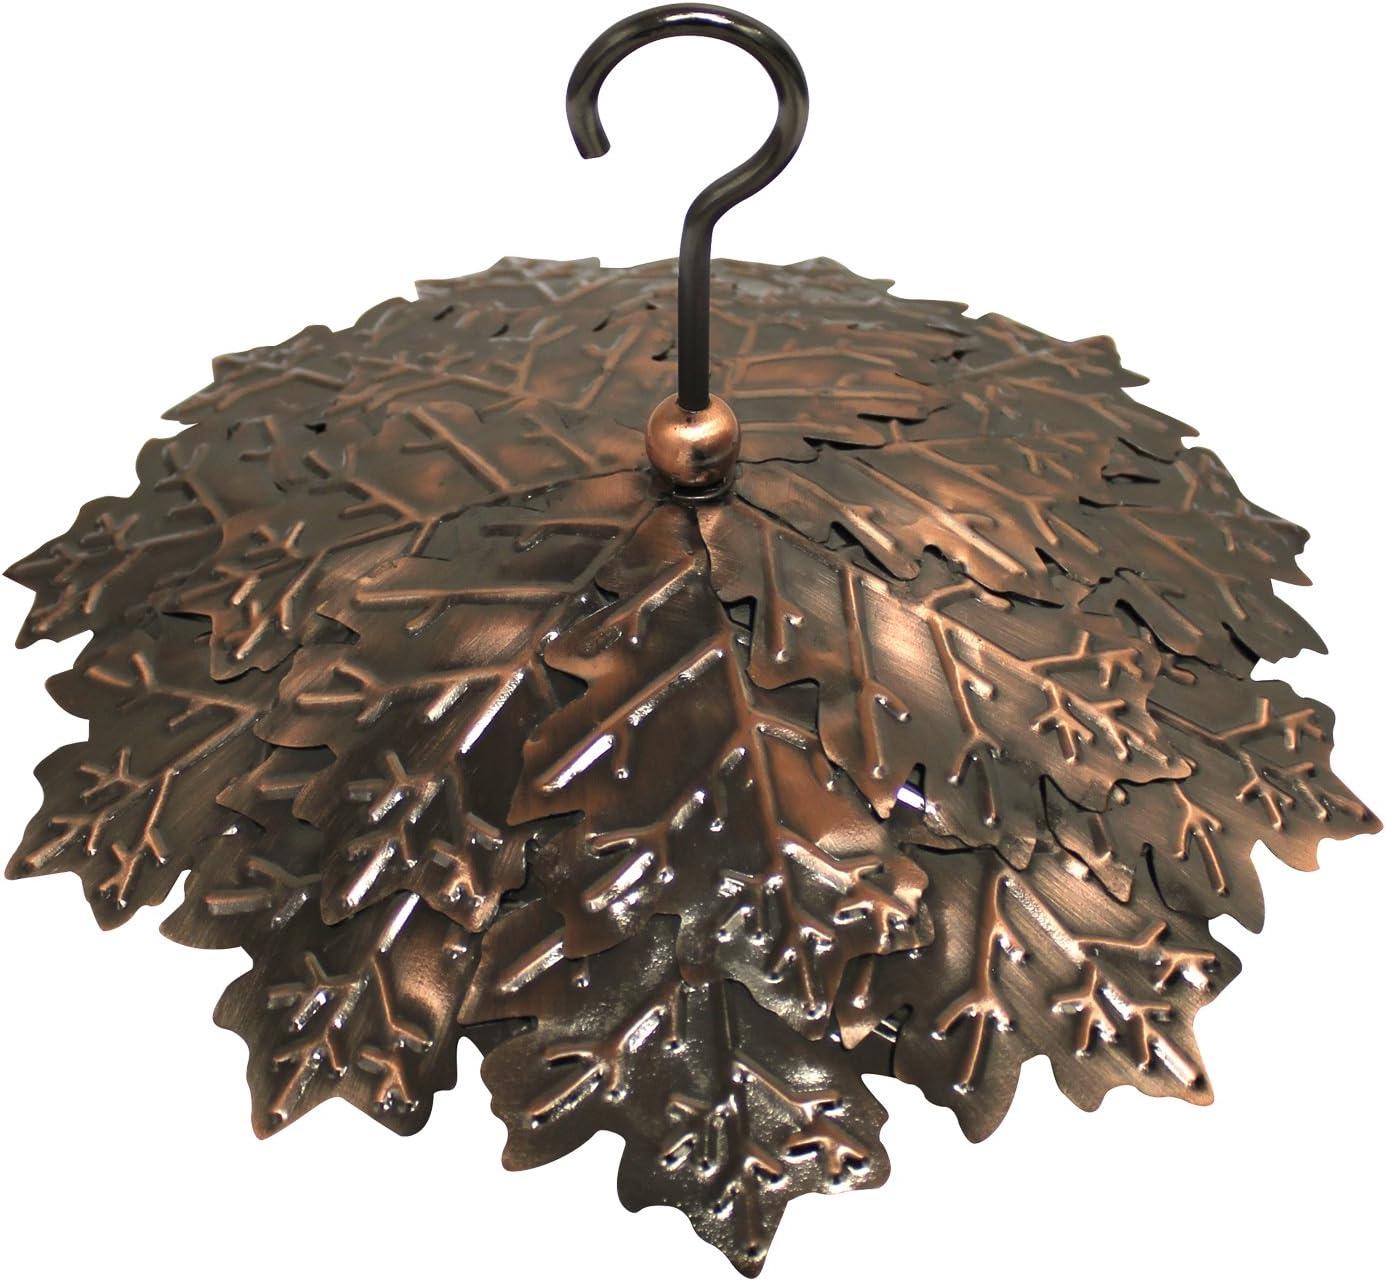 Heath Outdoor Products RG-2 Copper Leaf Rain Guard